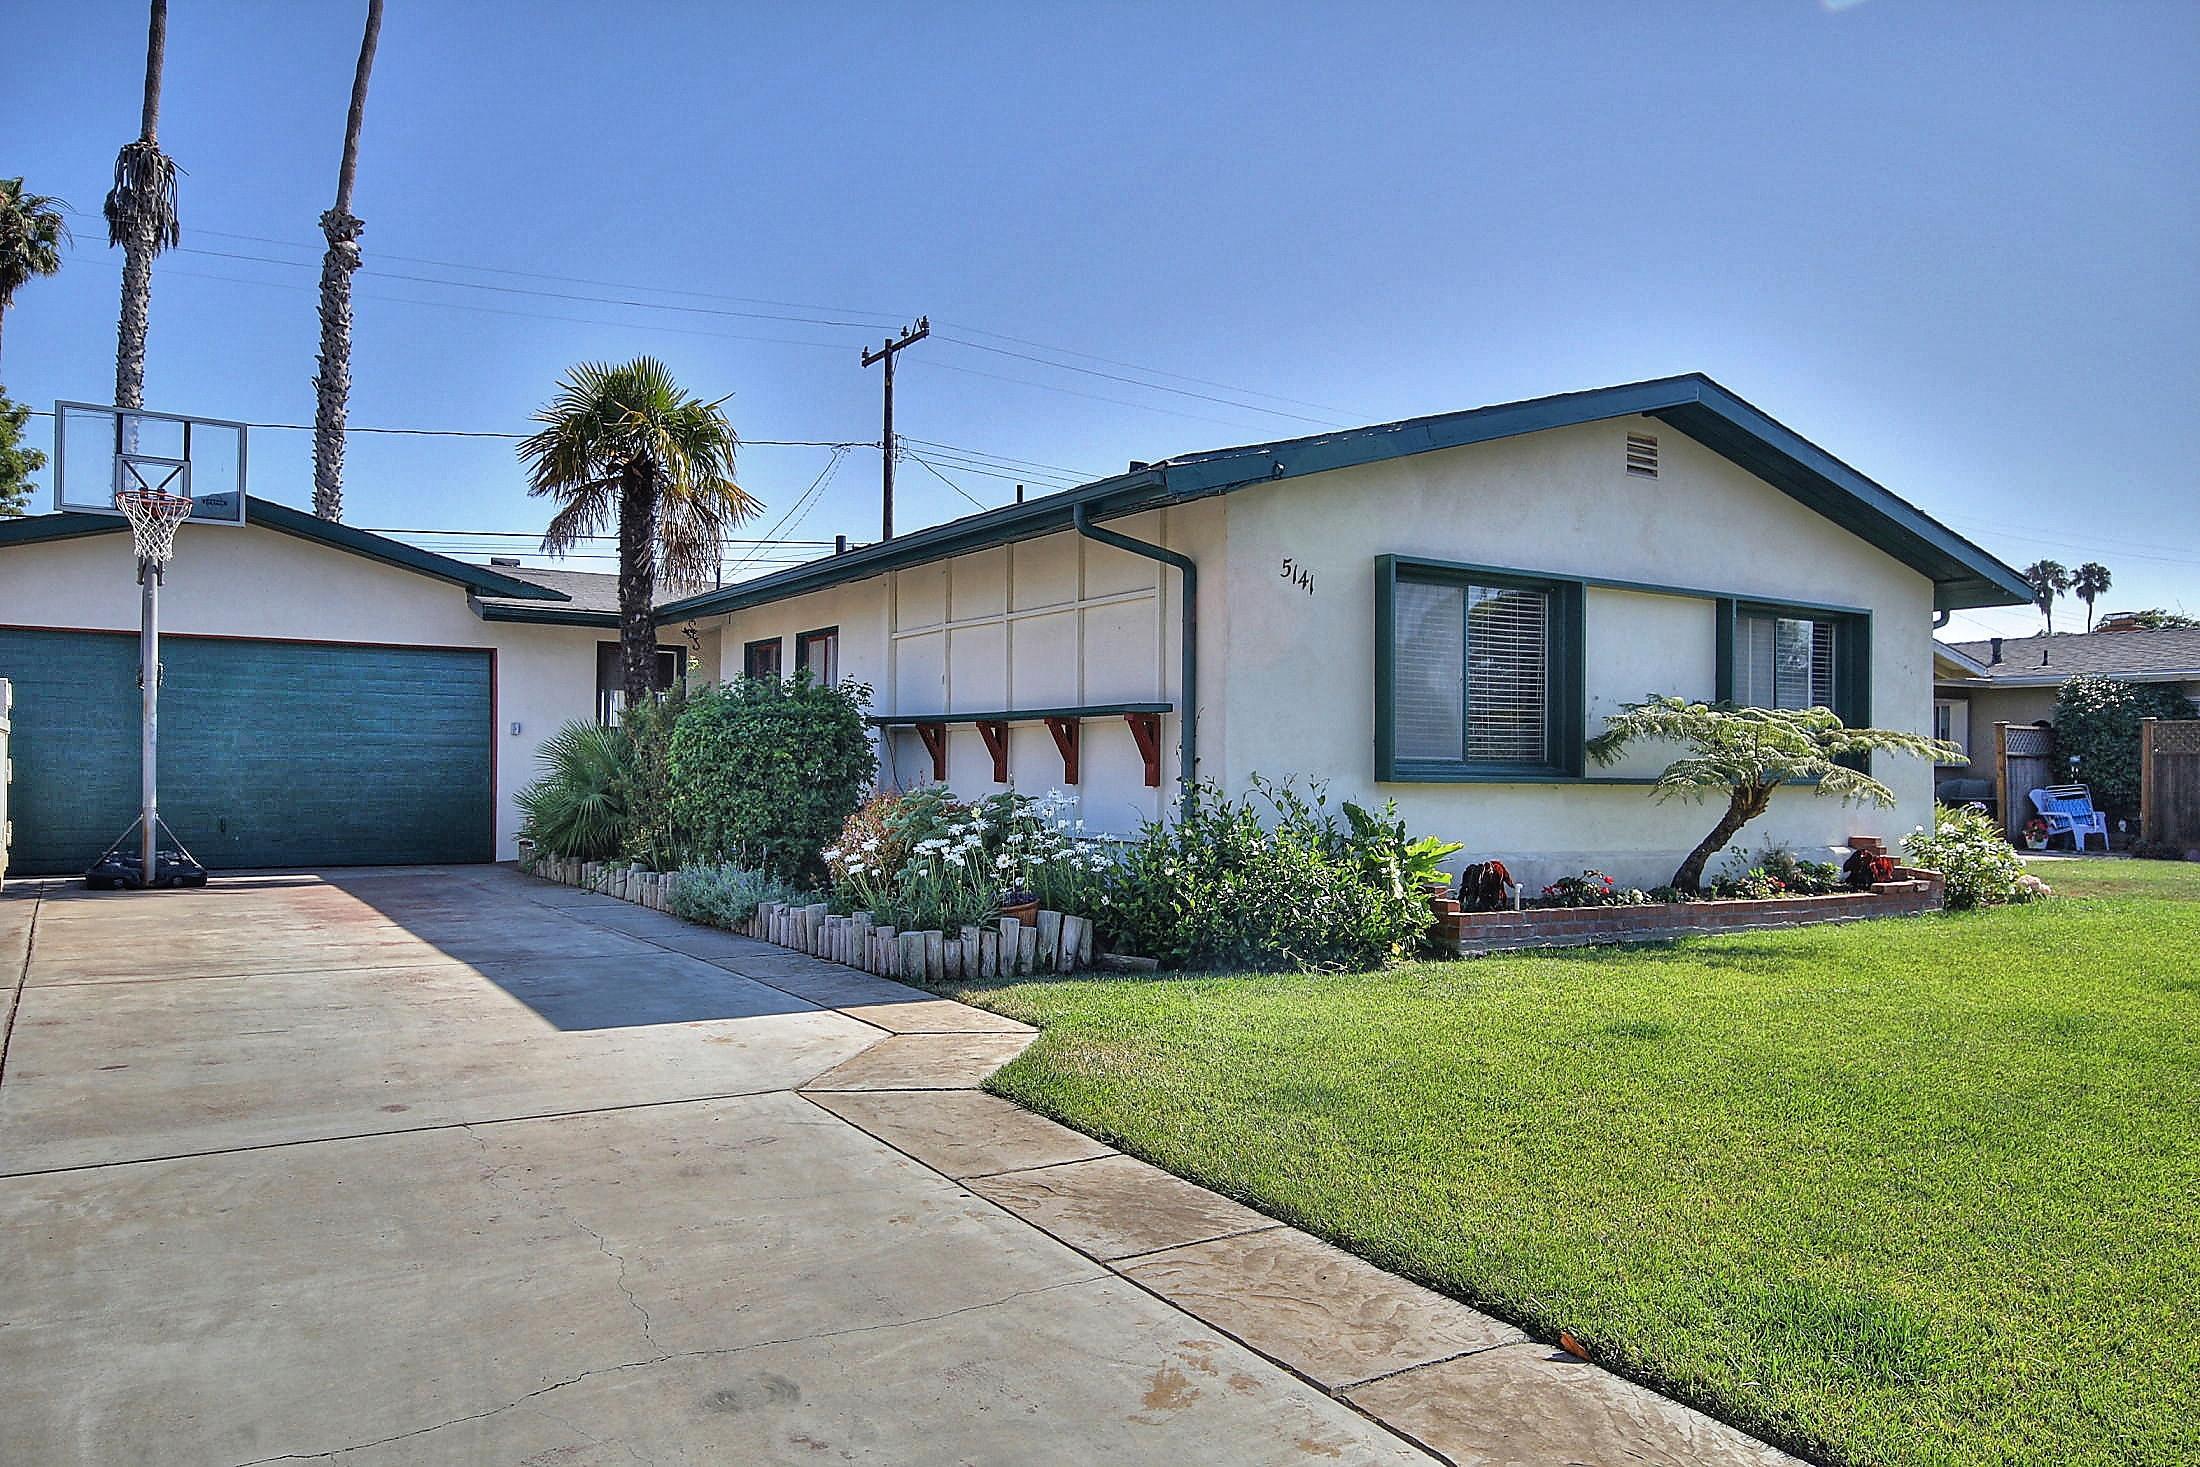 Property photo for 5141 San Vicente Dr Santa Barbara, California 93111 - 13-2249